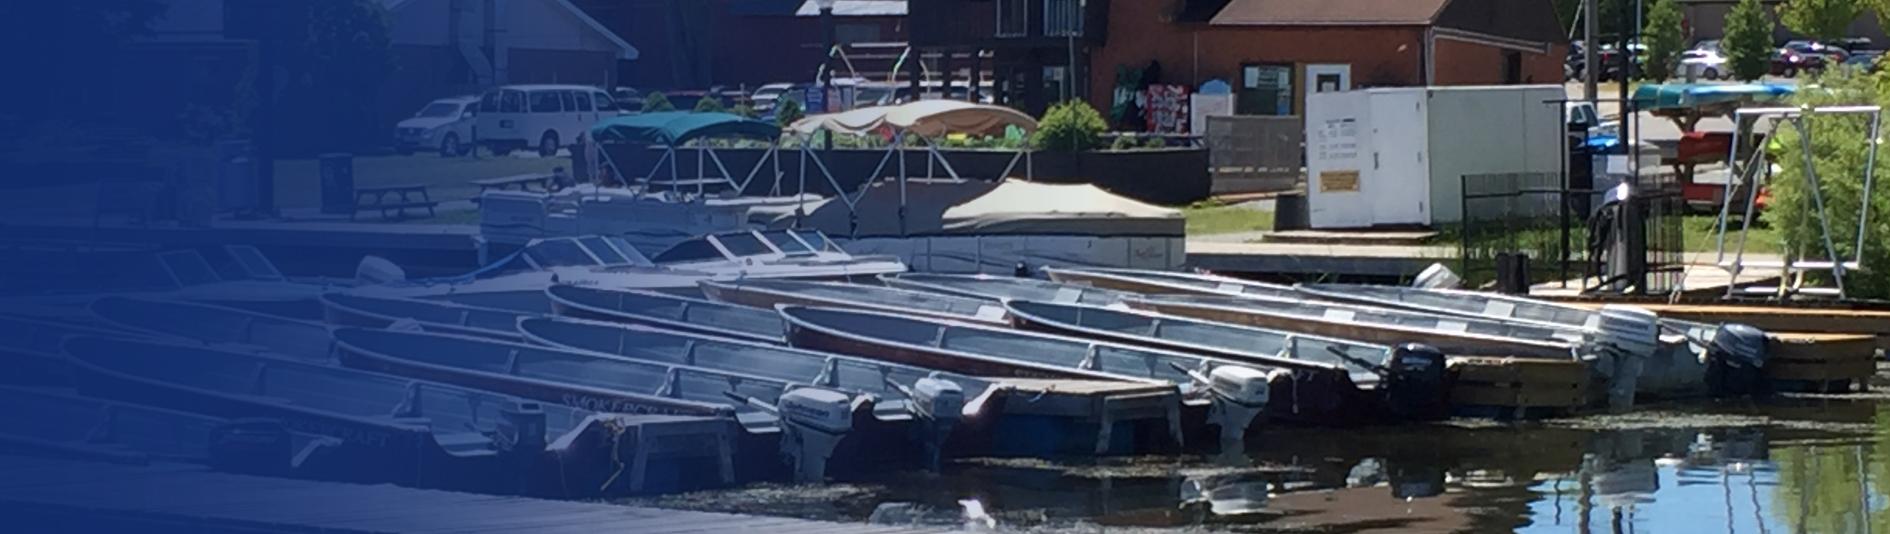 Boat Rentals near Toronto